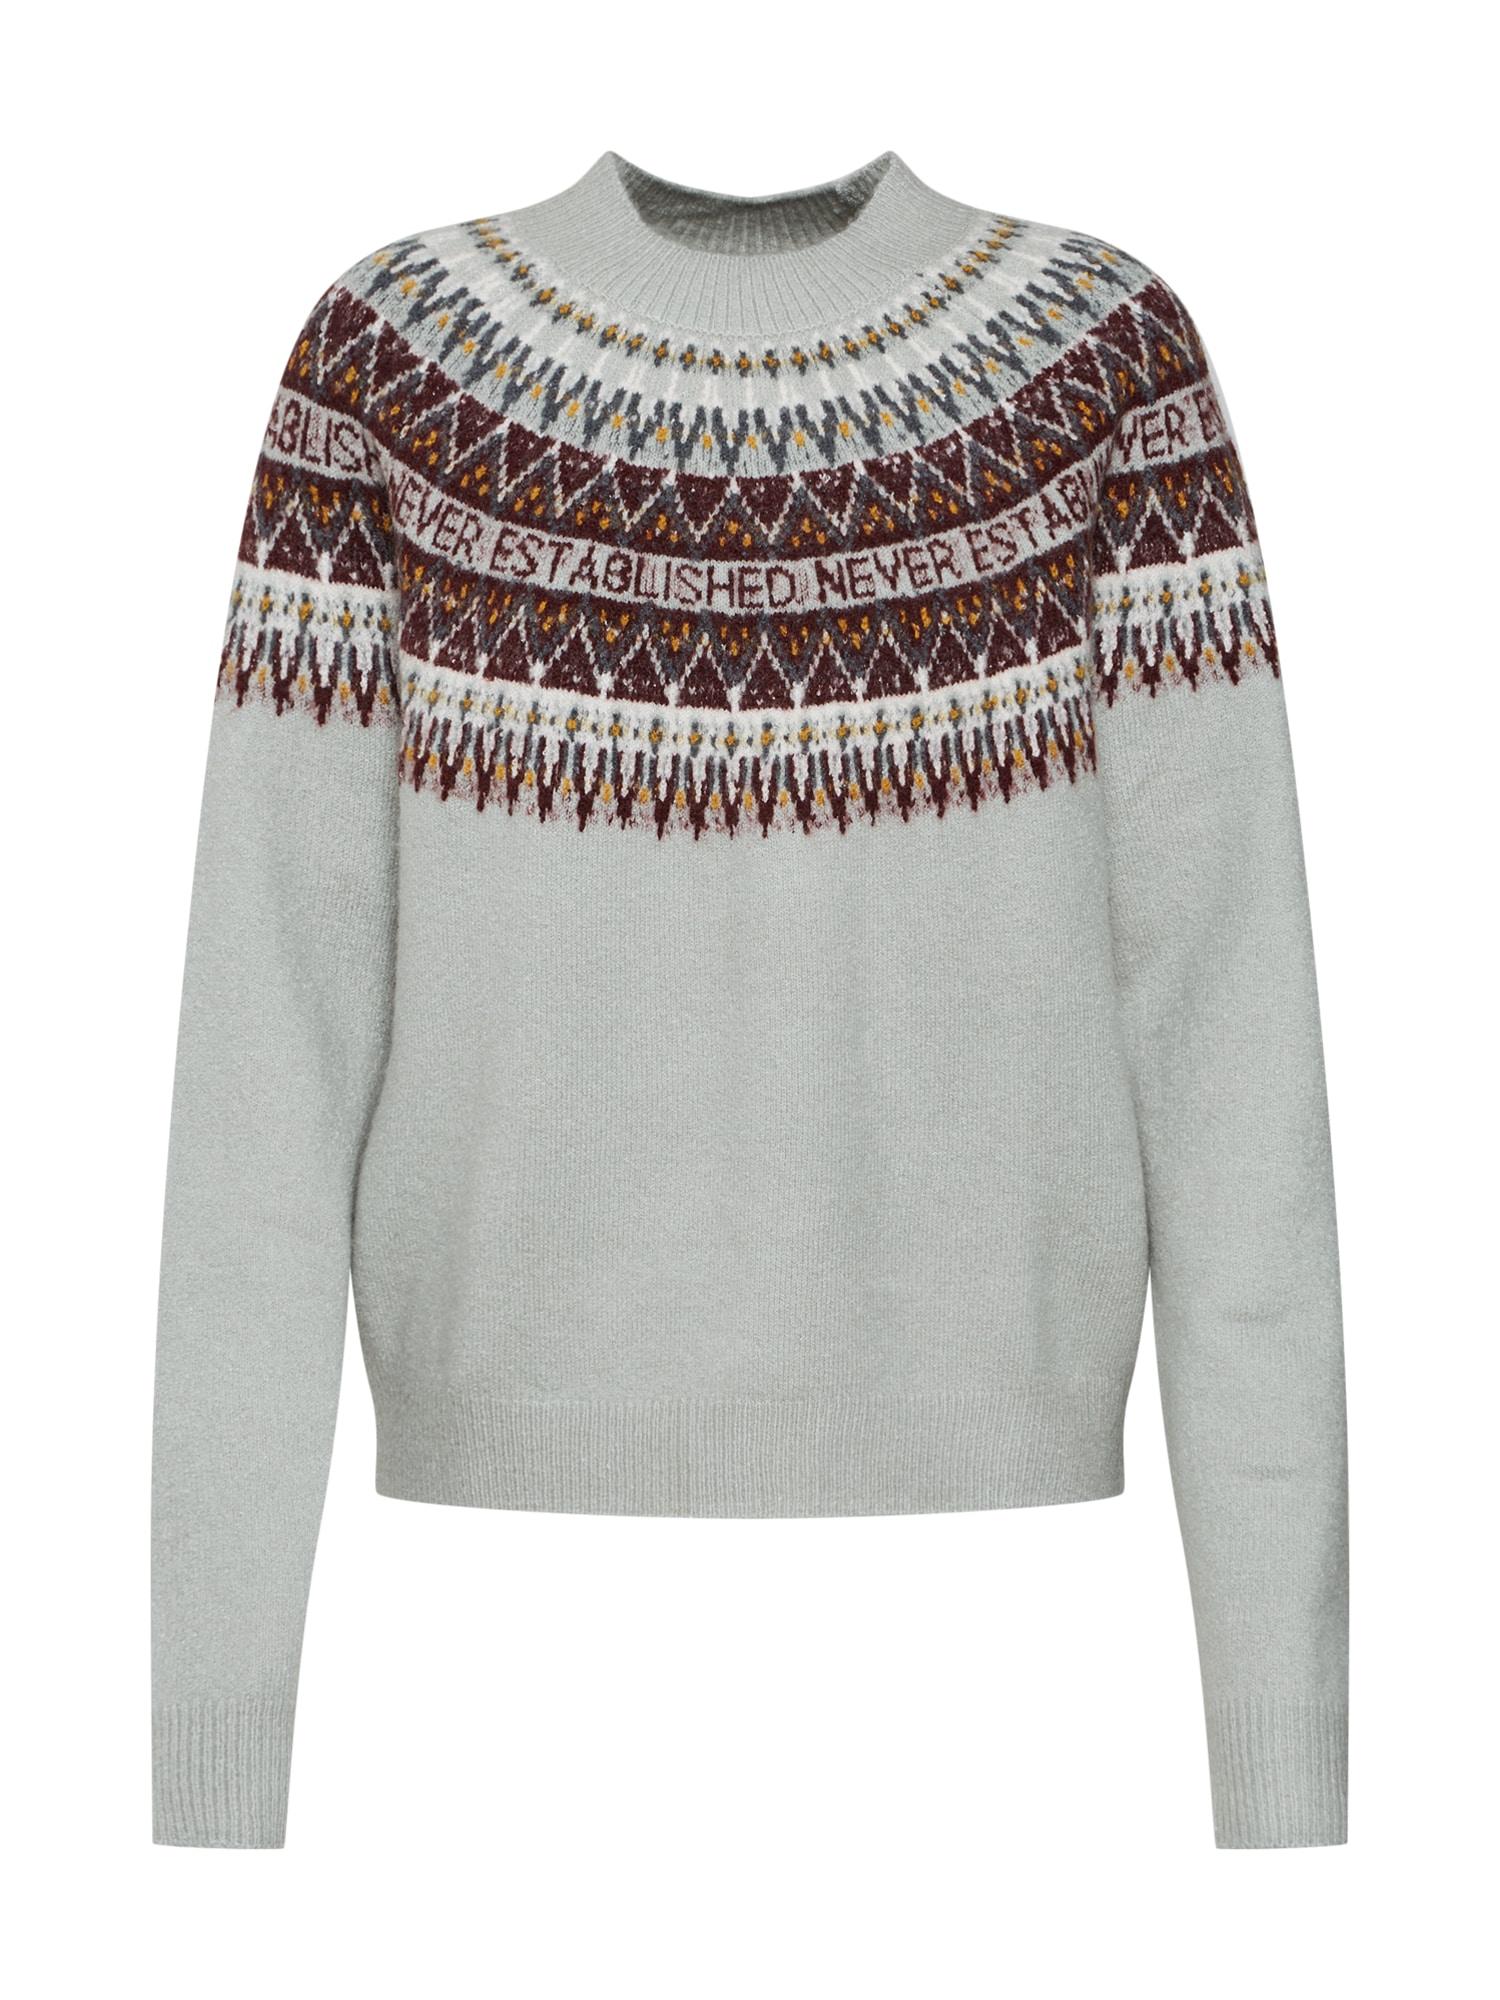 Tijgerprint Trui.Truien Online Kopen Fashionchick Nl Alle Truien Trends